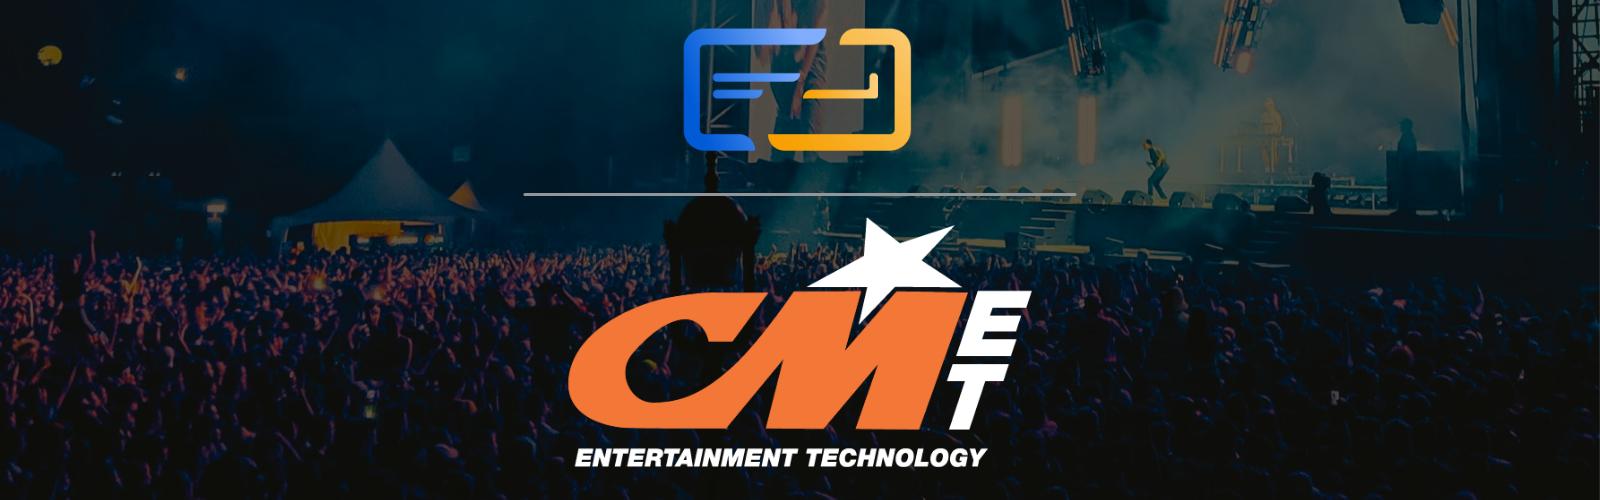 Entertainment Hoists Available Now